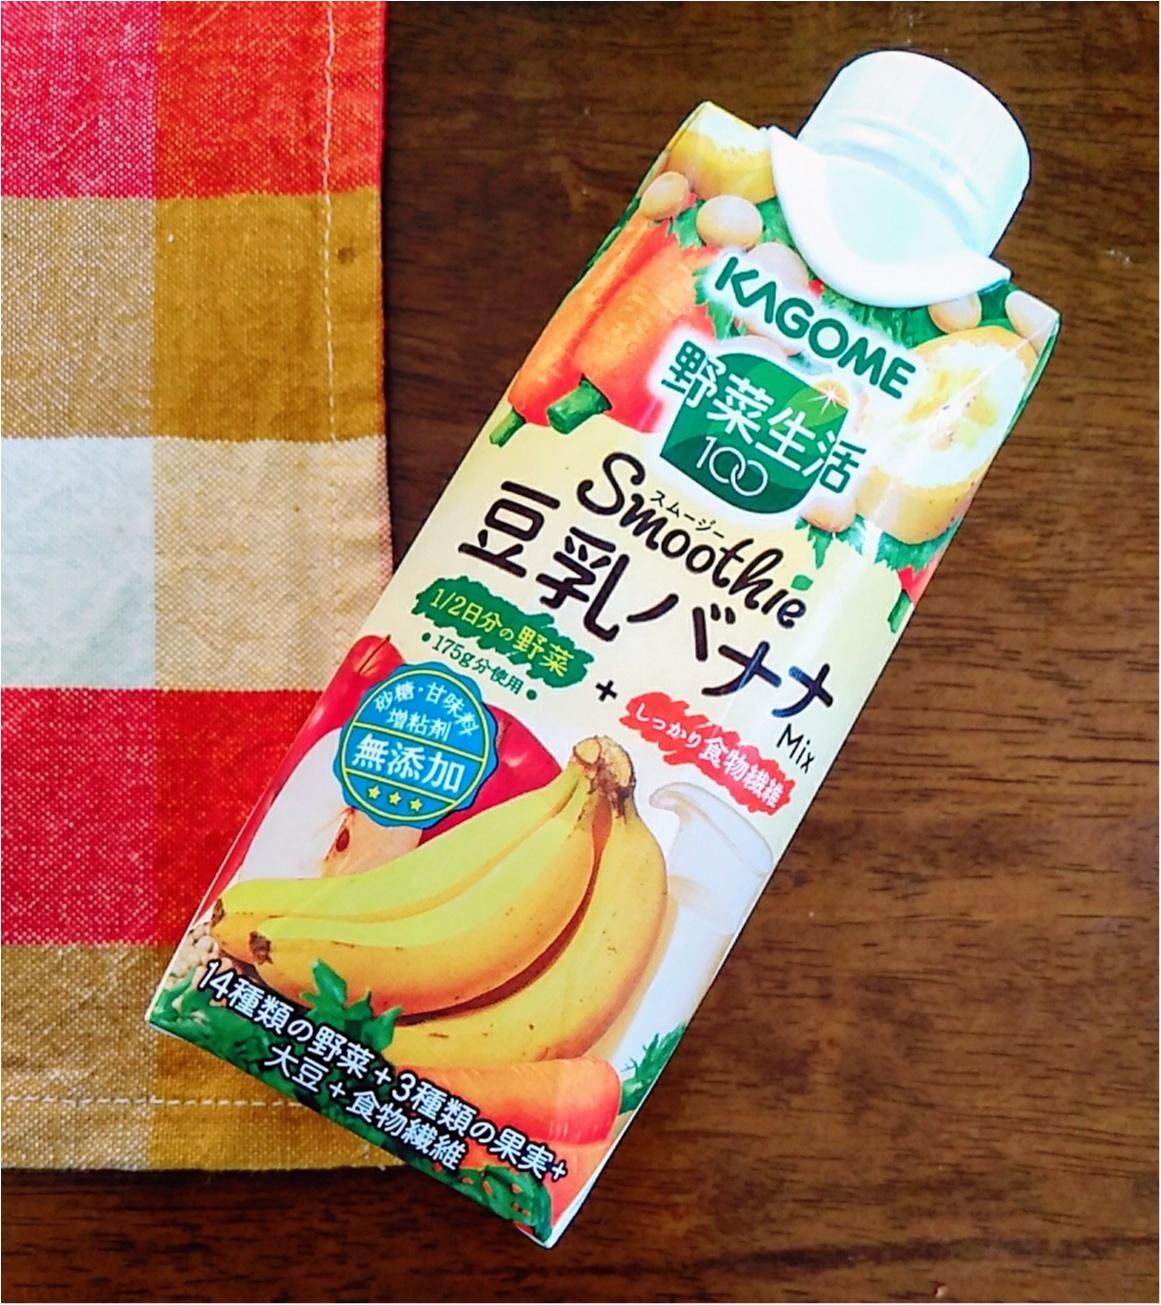 KAGOME野菜生活《豆乳バナナスムージー》でお野菜と食物繊維を手軽に摂取♢(443 まゆ_1